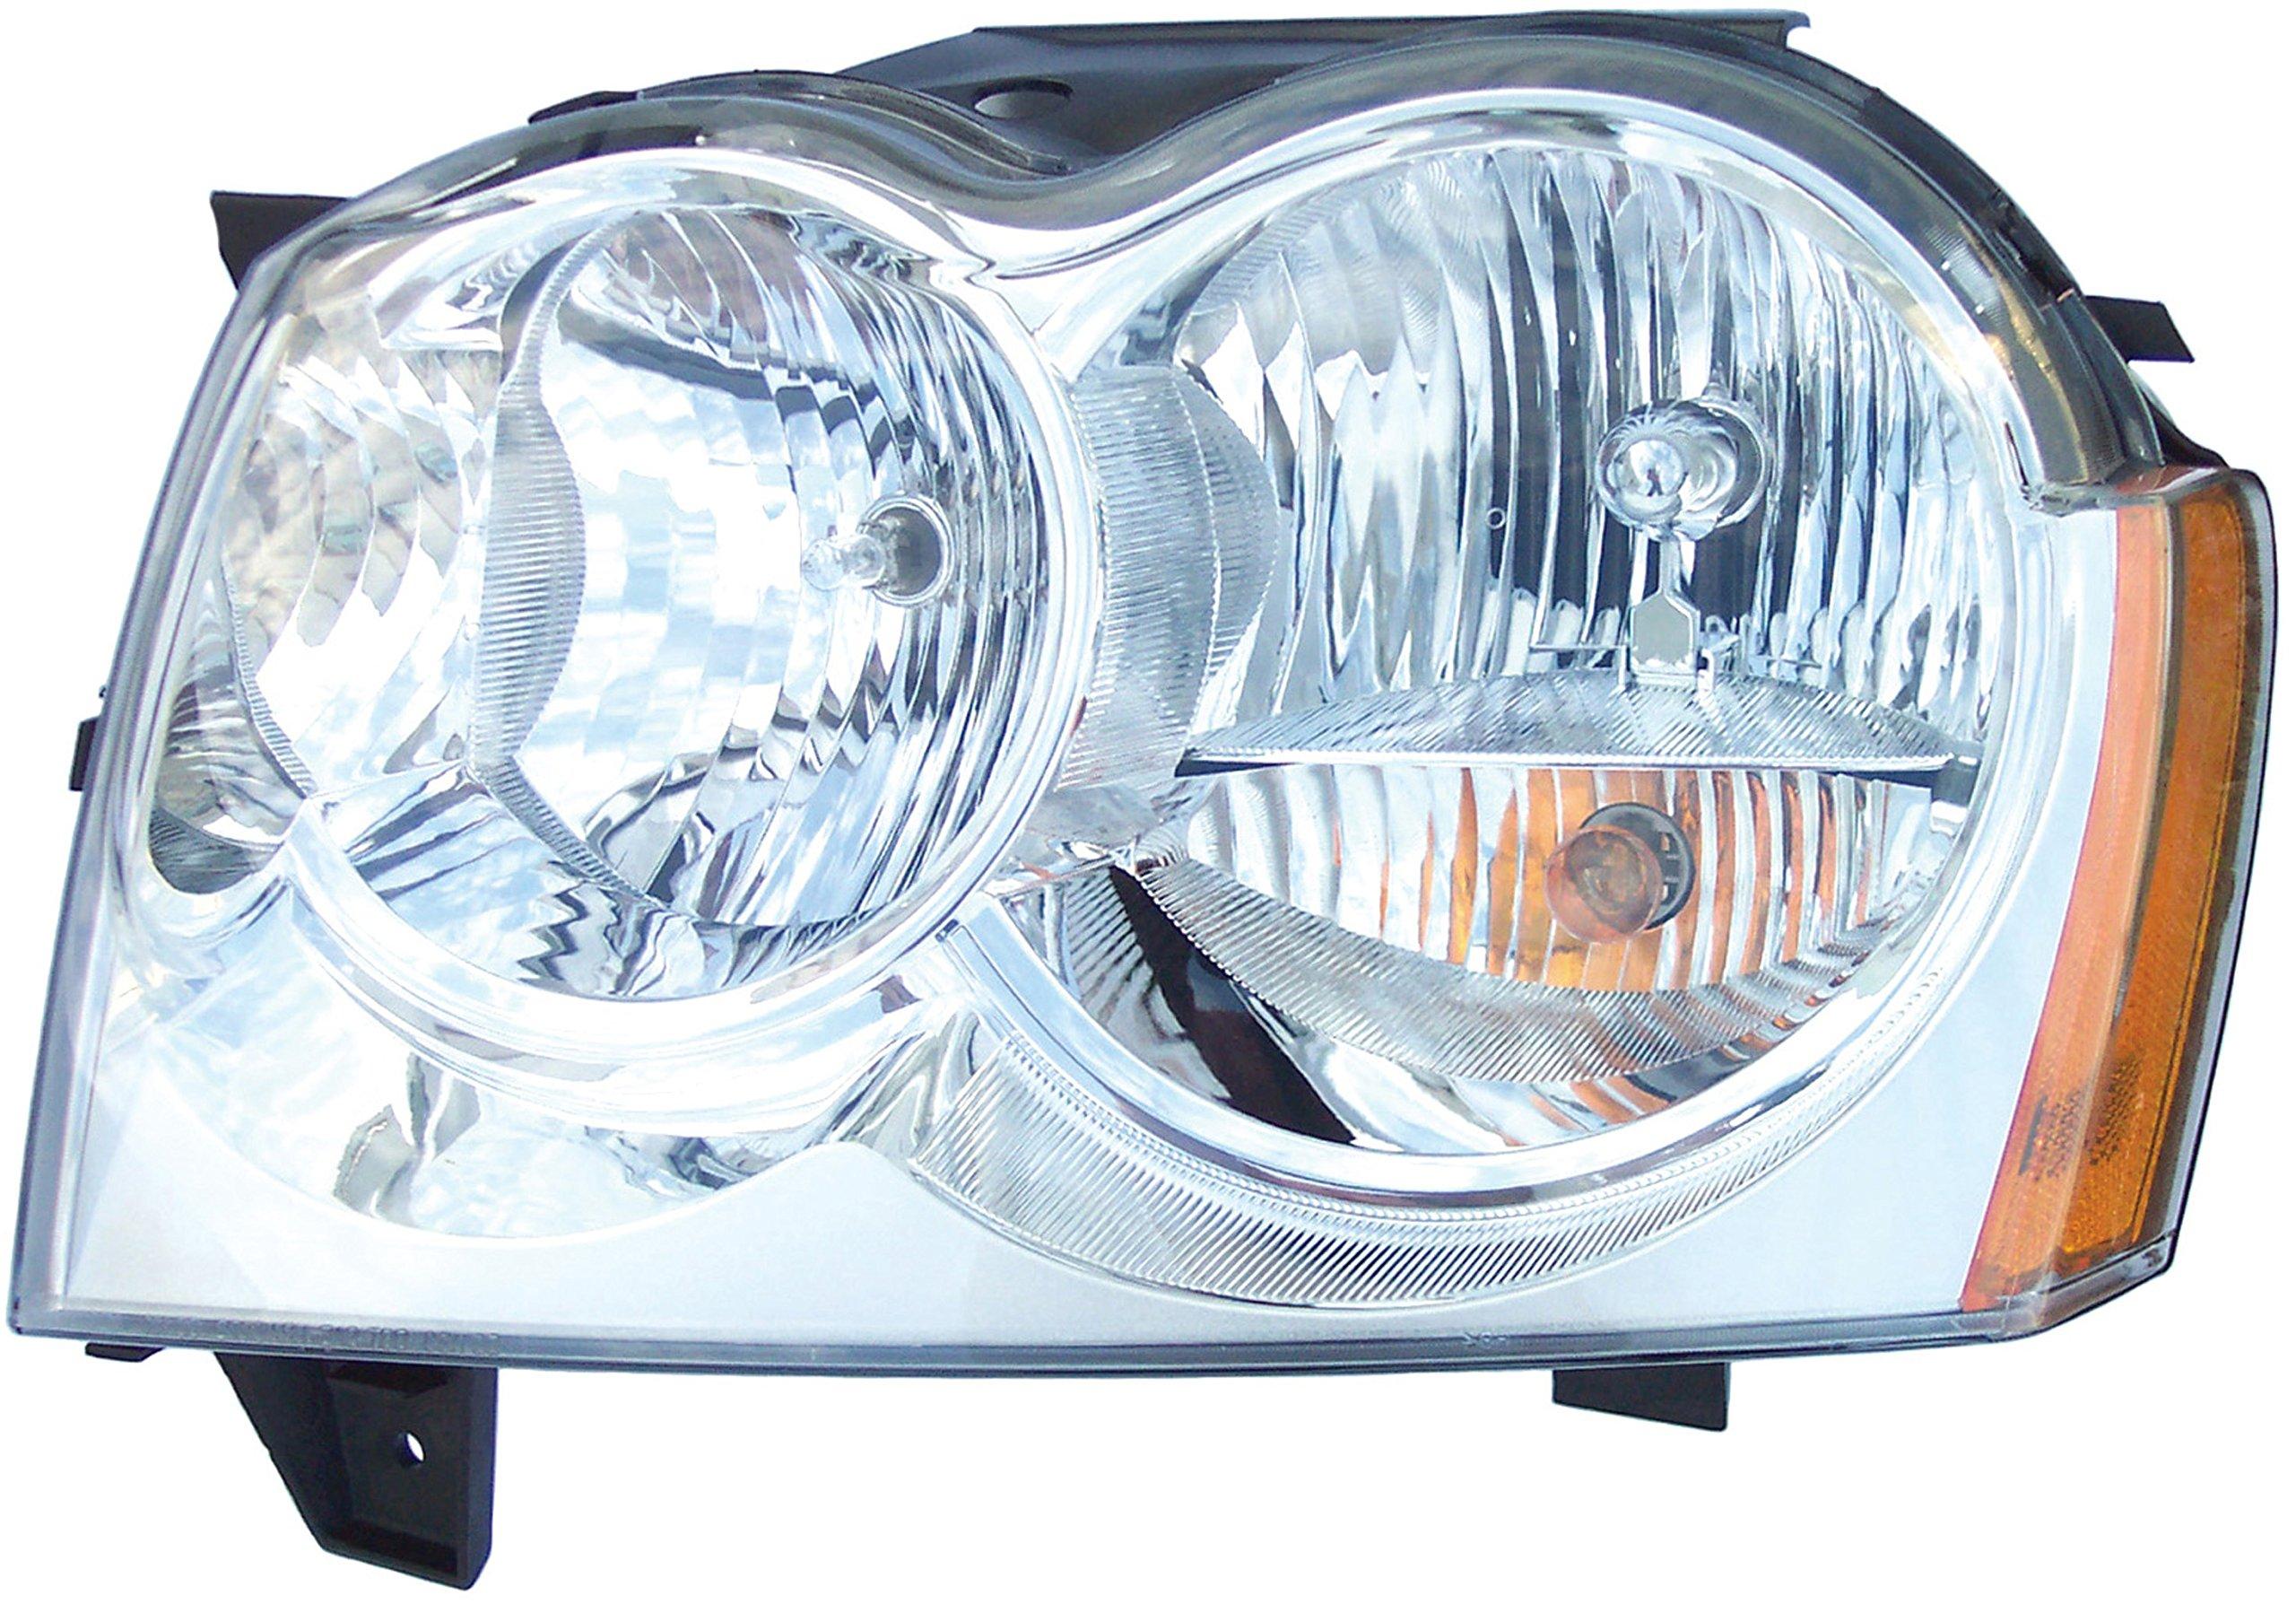 Dorman 1591006 Driver Side Headlight Assembly For Select Chevrolet Models